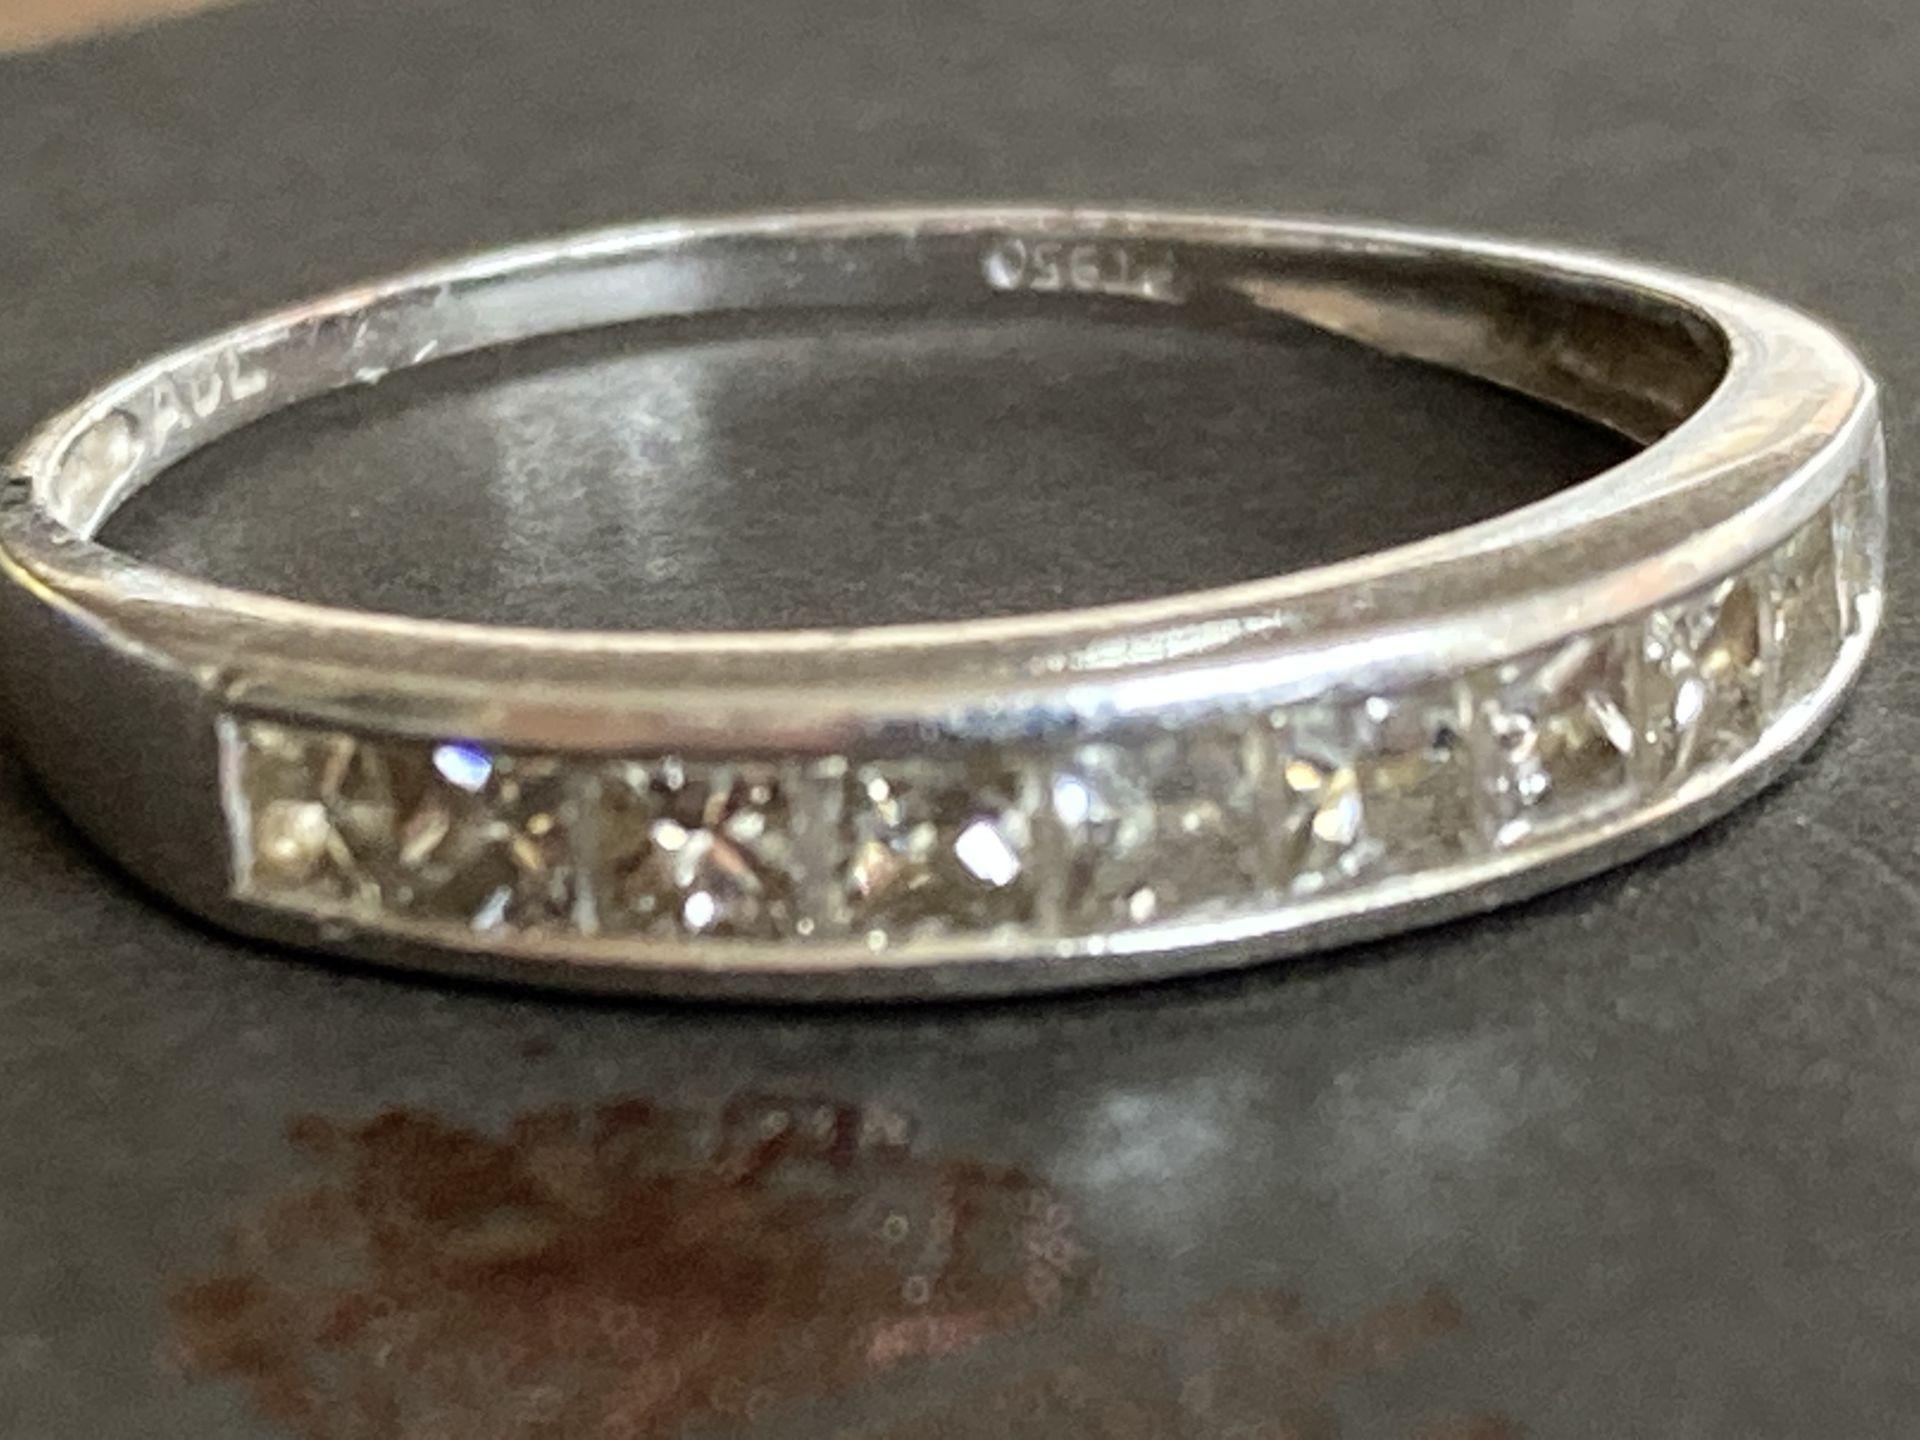 PLATINUM 0.5CT DIAMOND RING - Image 2 of 2